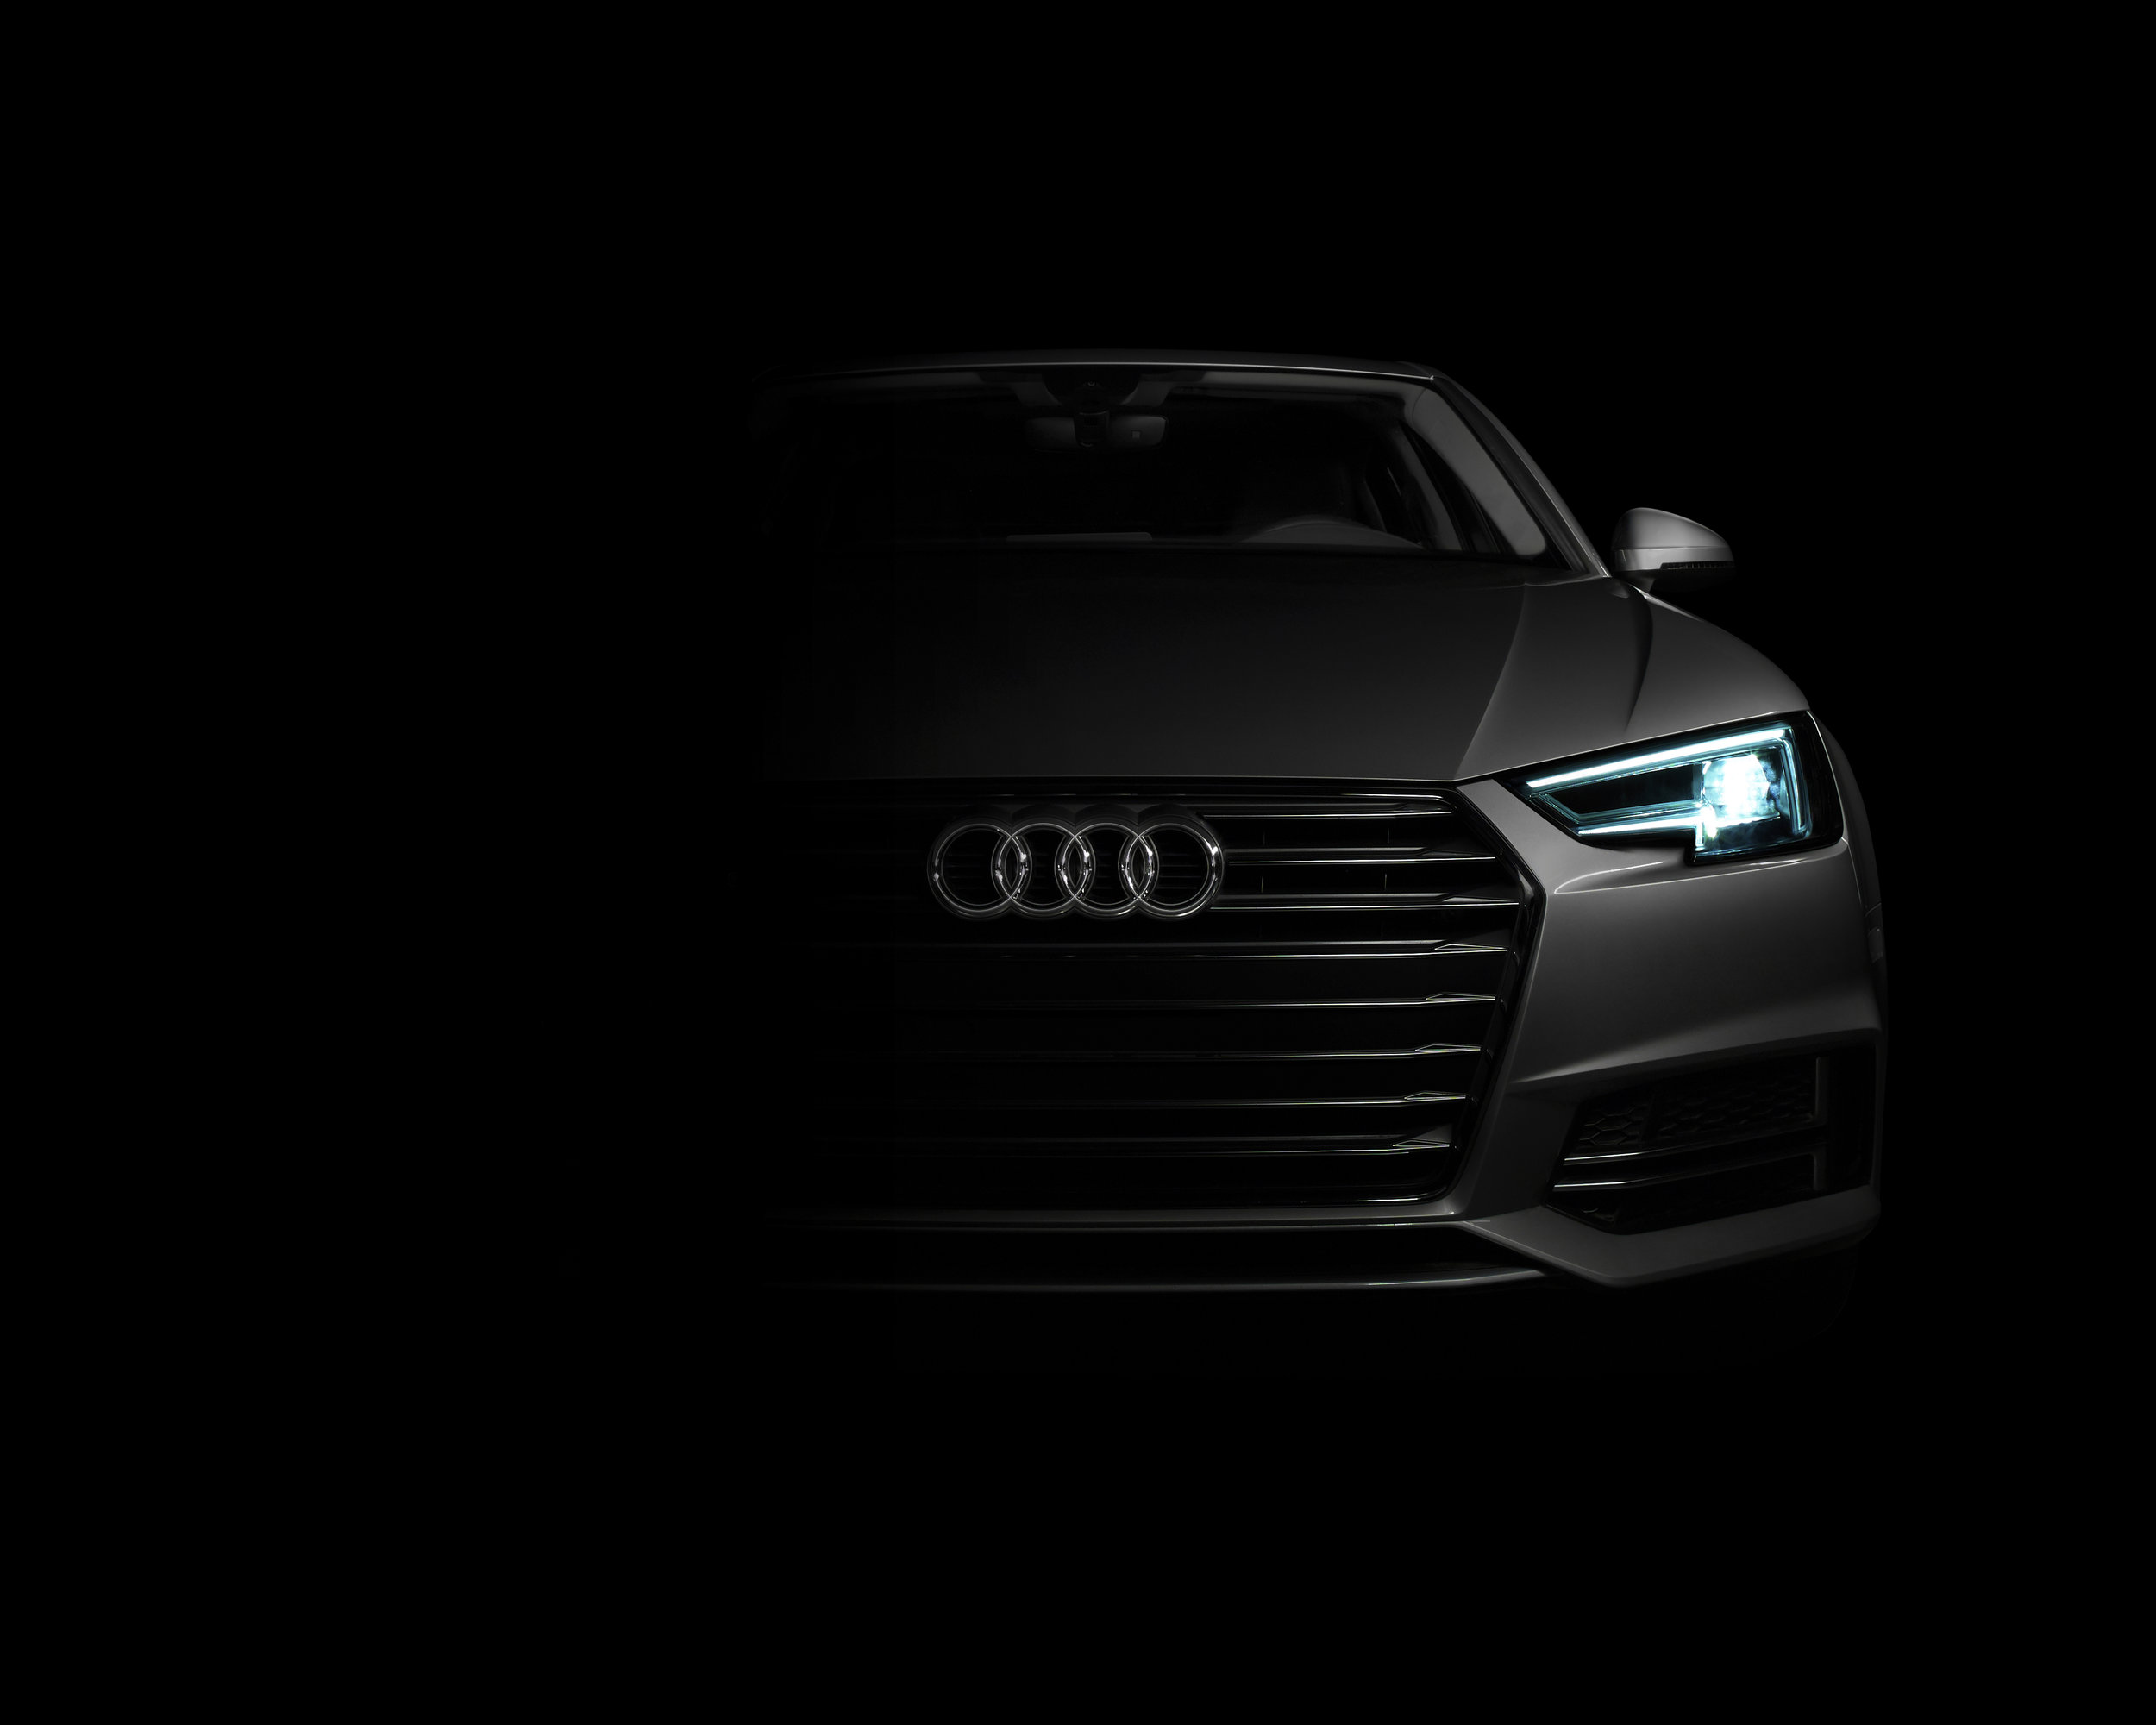 Audi_A4_In_The_Spotlight_04_NoHL.jpg